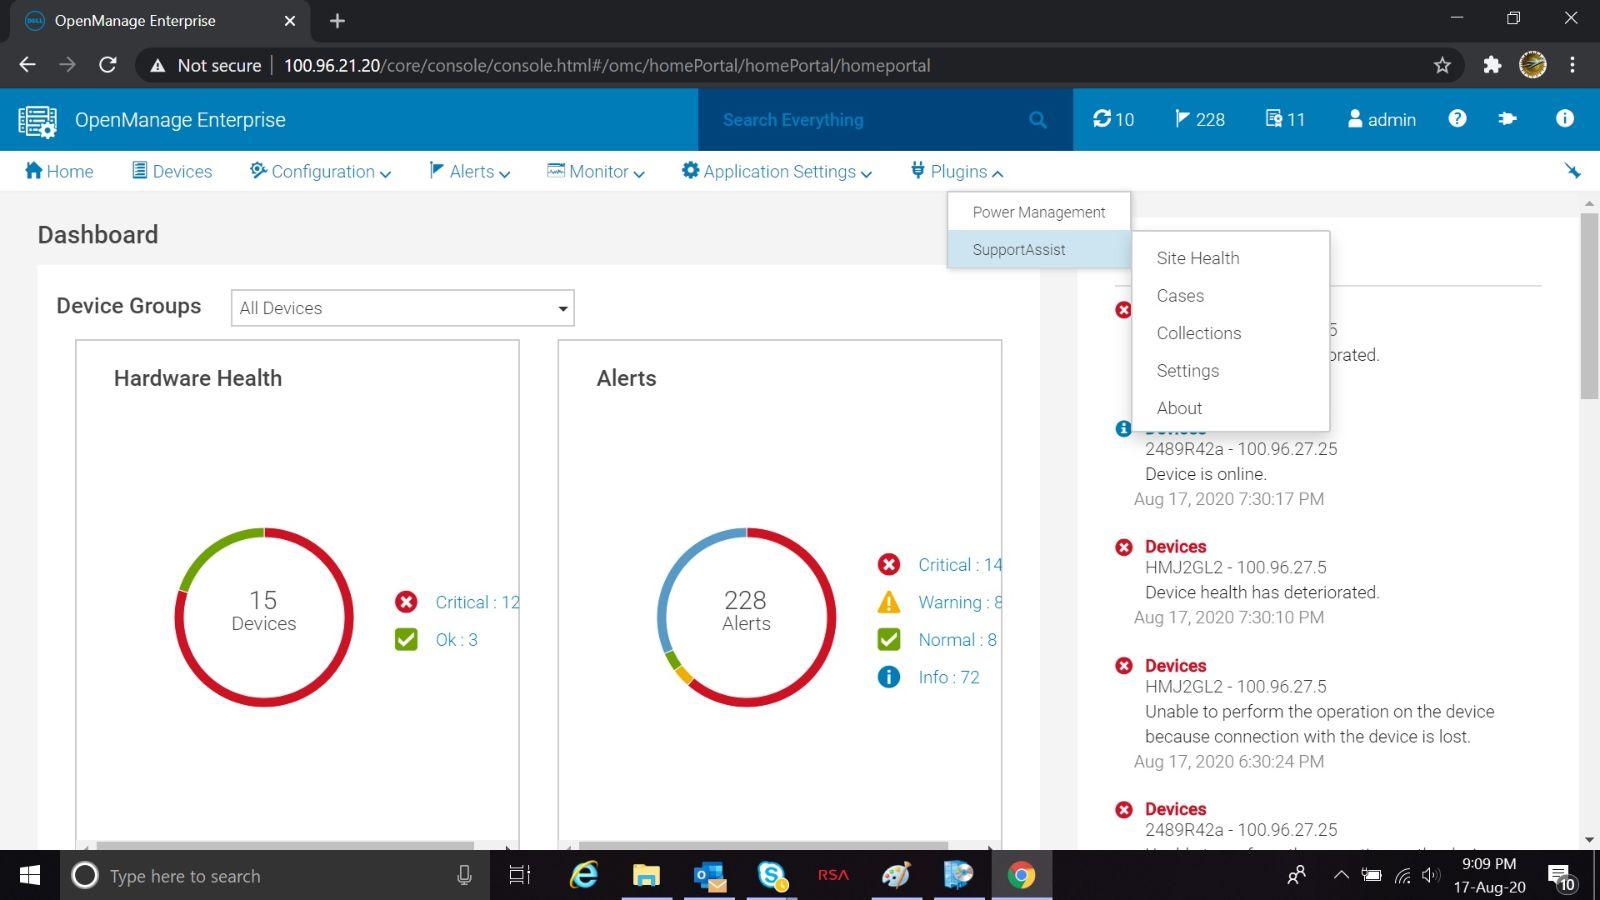 Nabídka softwaru Dell EMC OpenManage Enterprise SupportAssist